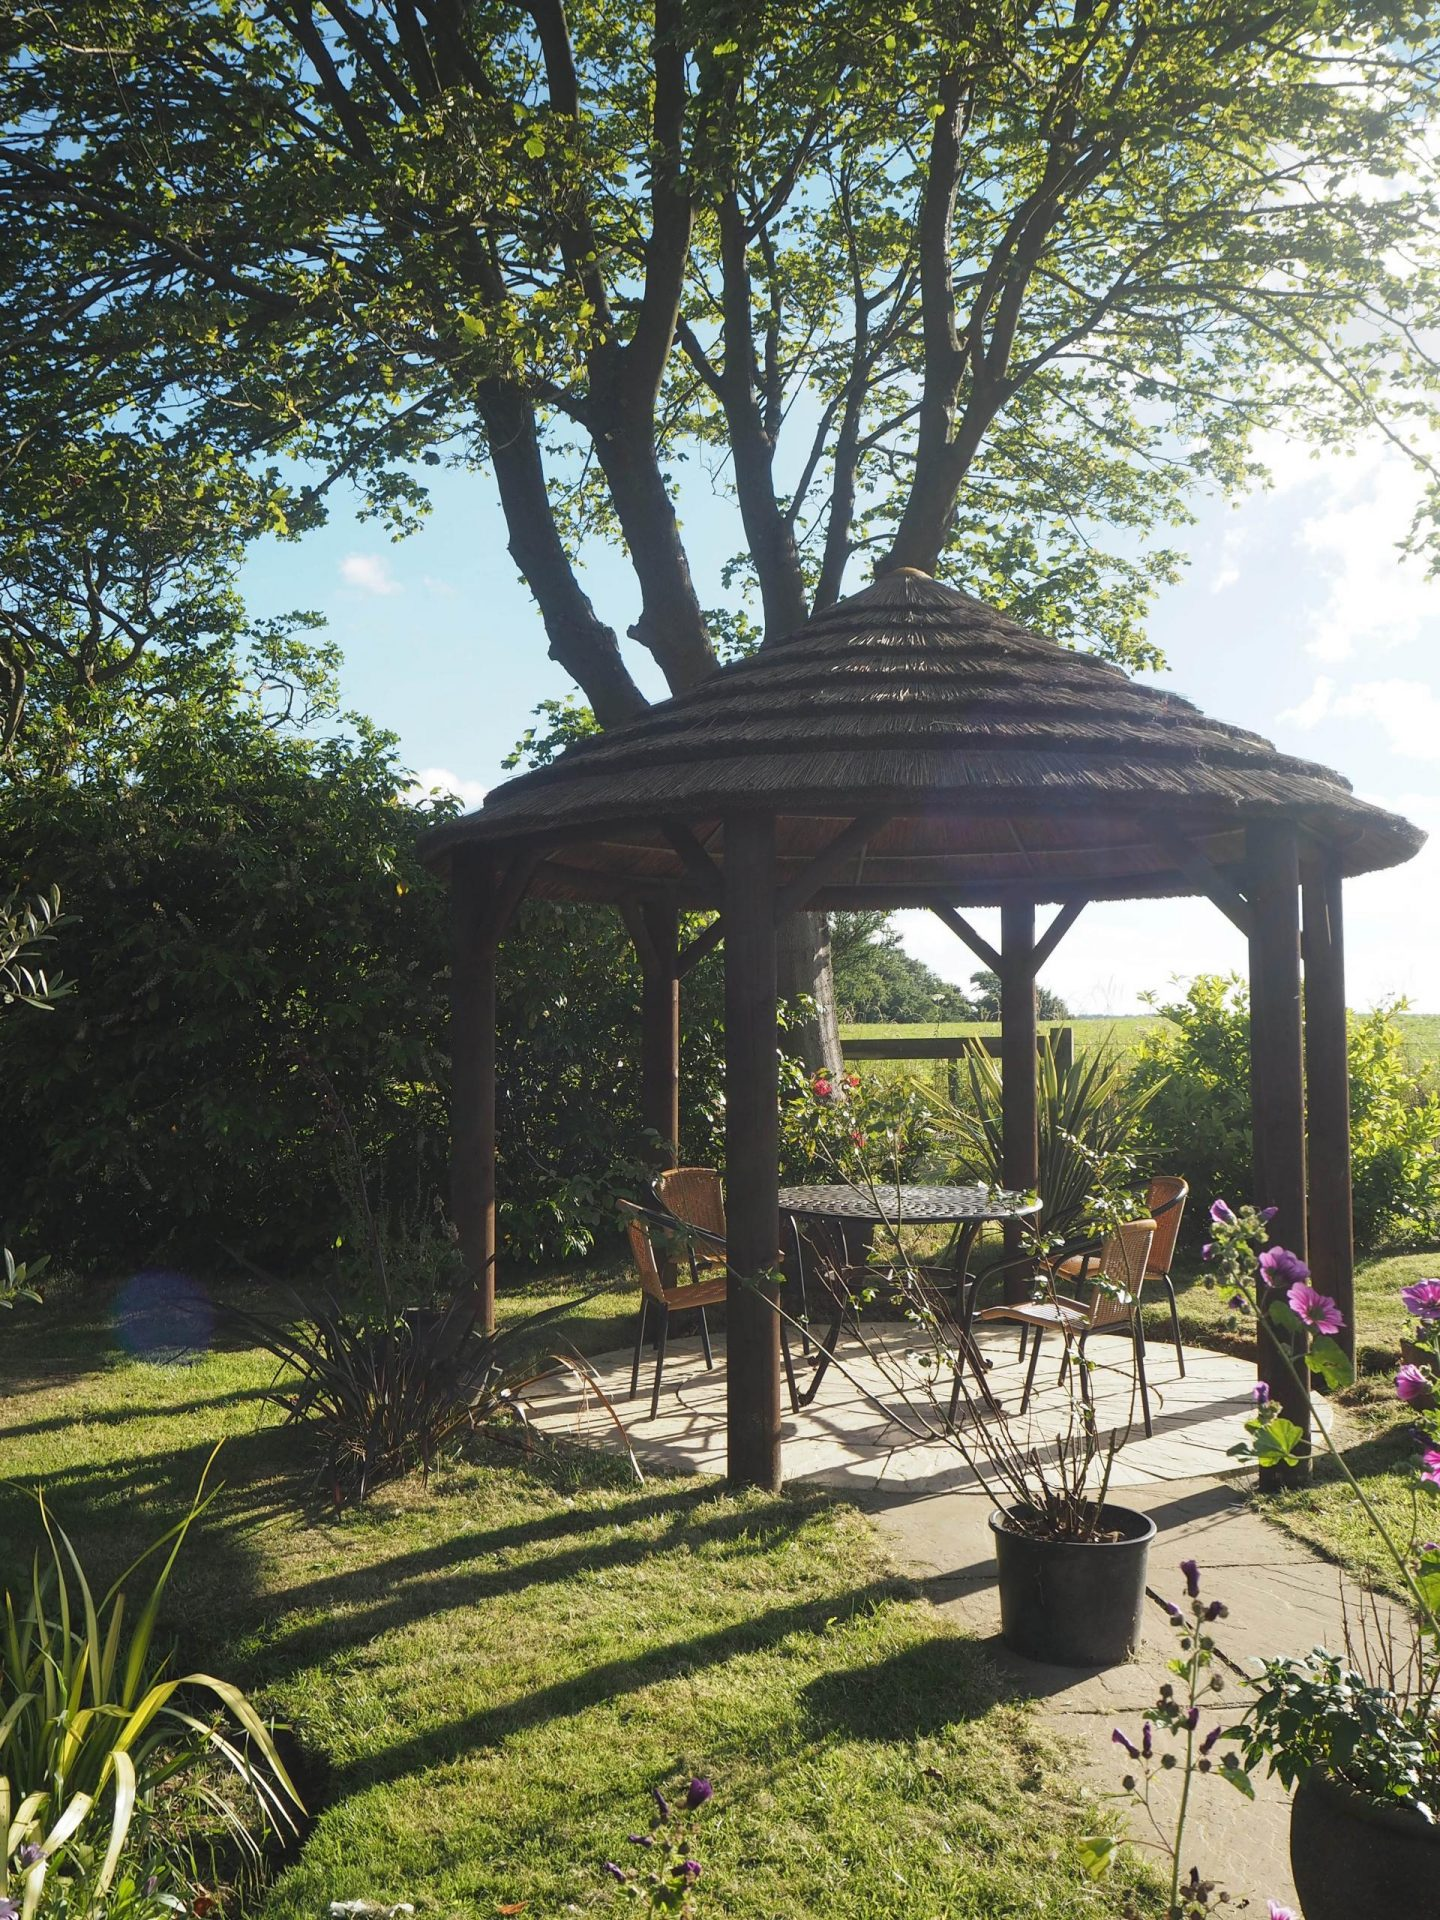 Ox Pasture Hall, Scarborough, North Yorkshire - Rachel Nicole UK Travel Blogger 10